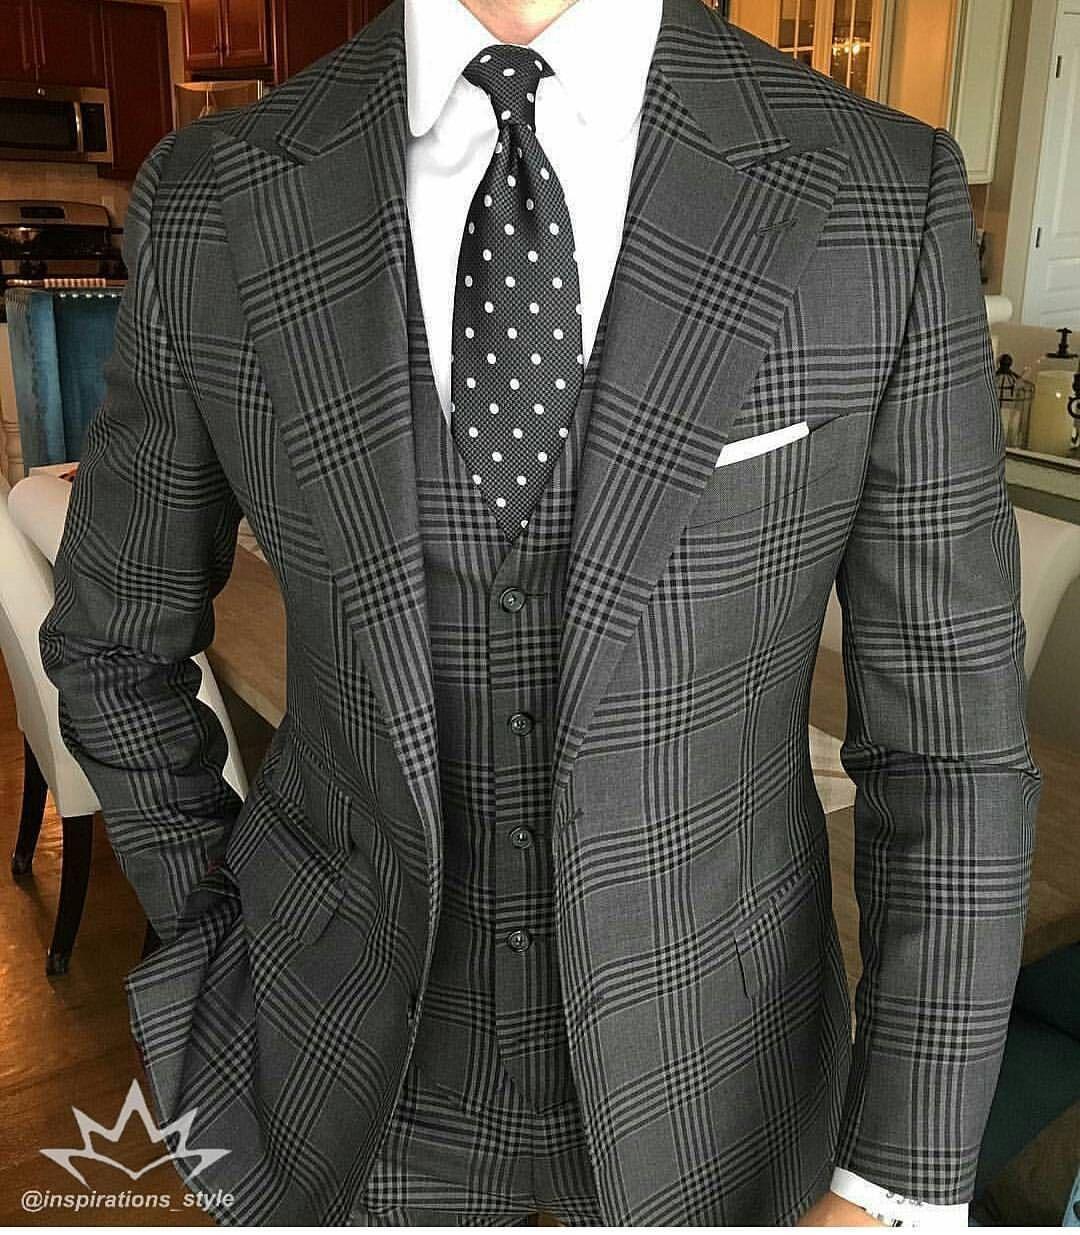 @absolutebespokeのInstagram写真をチェック • いいね!2,876件. Man SuitMens Check SuitsGrey  ...